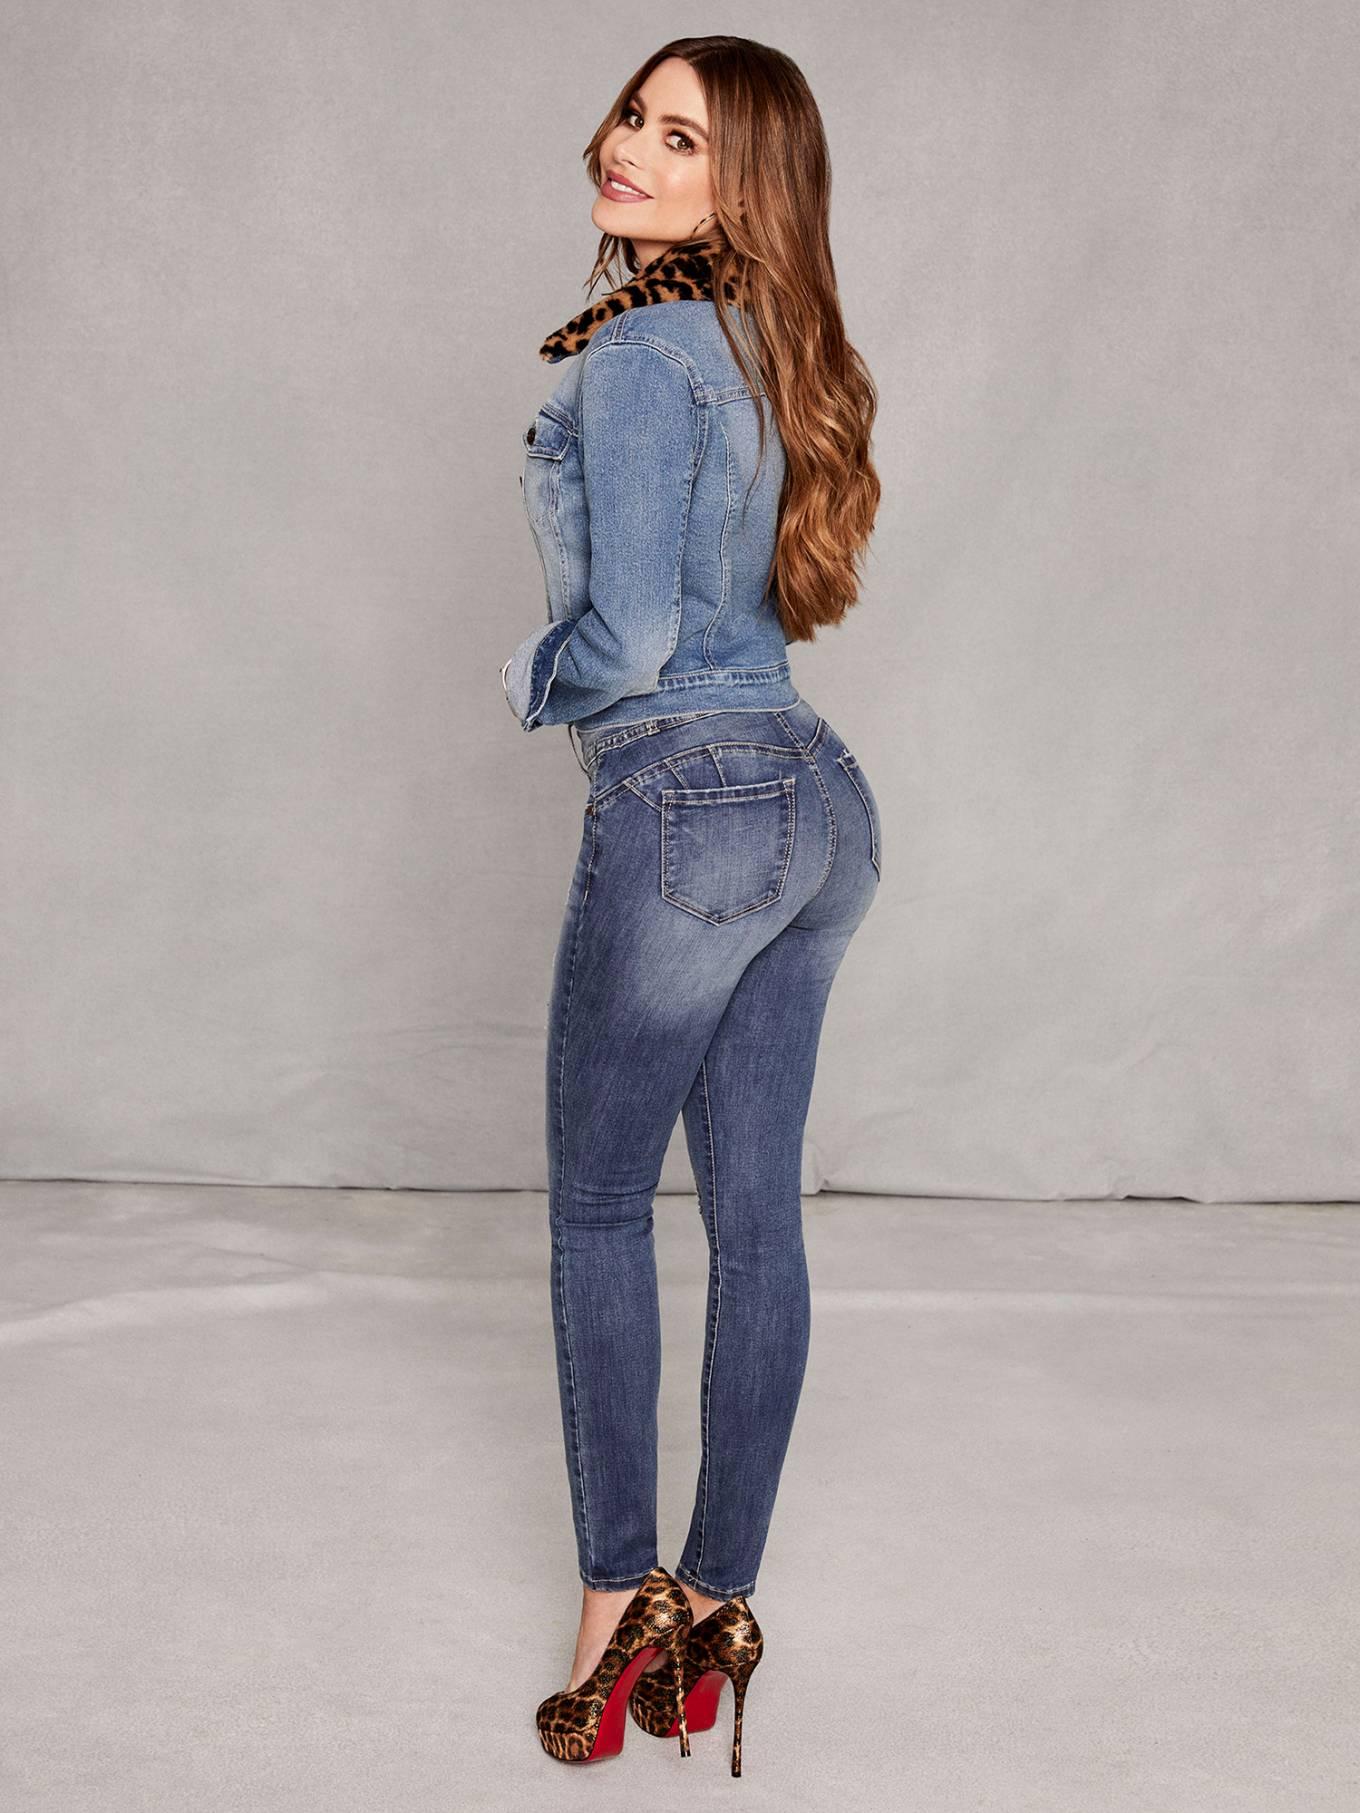 Sofia Vergara - Walmart jeans collection 2020